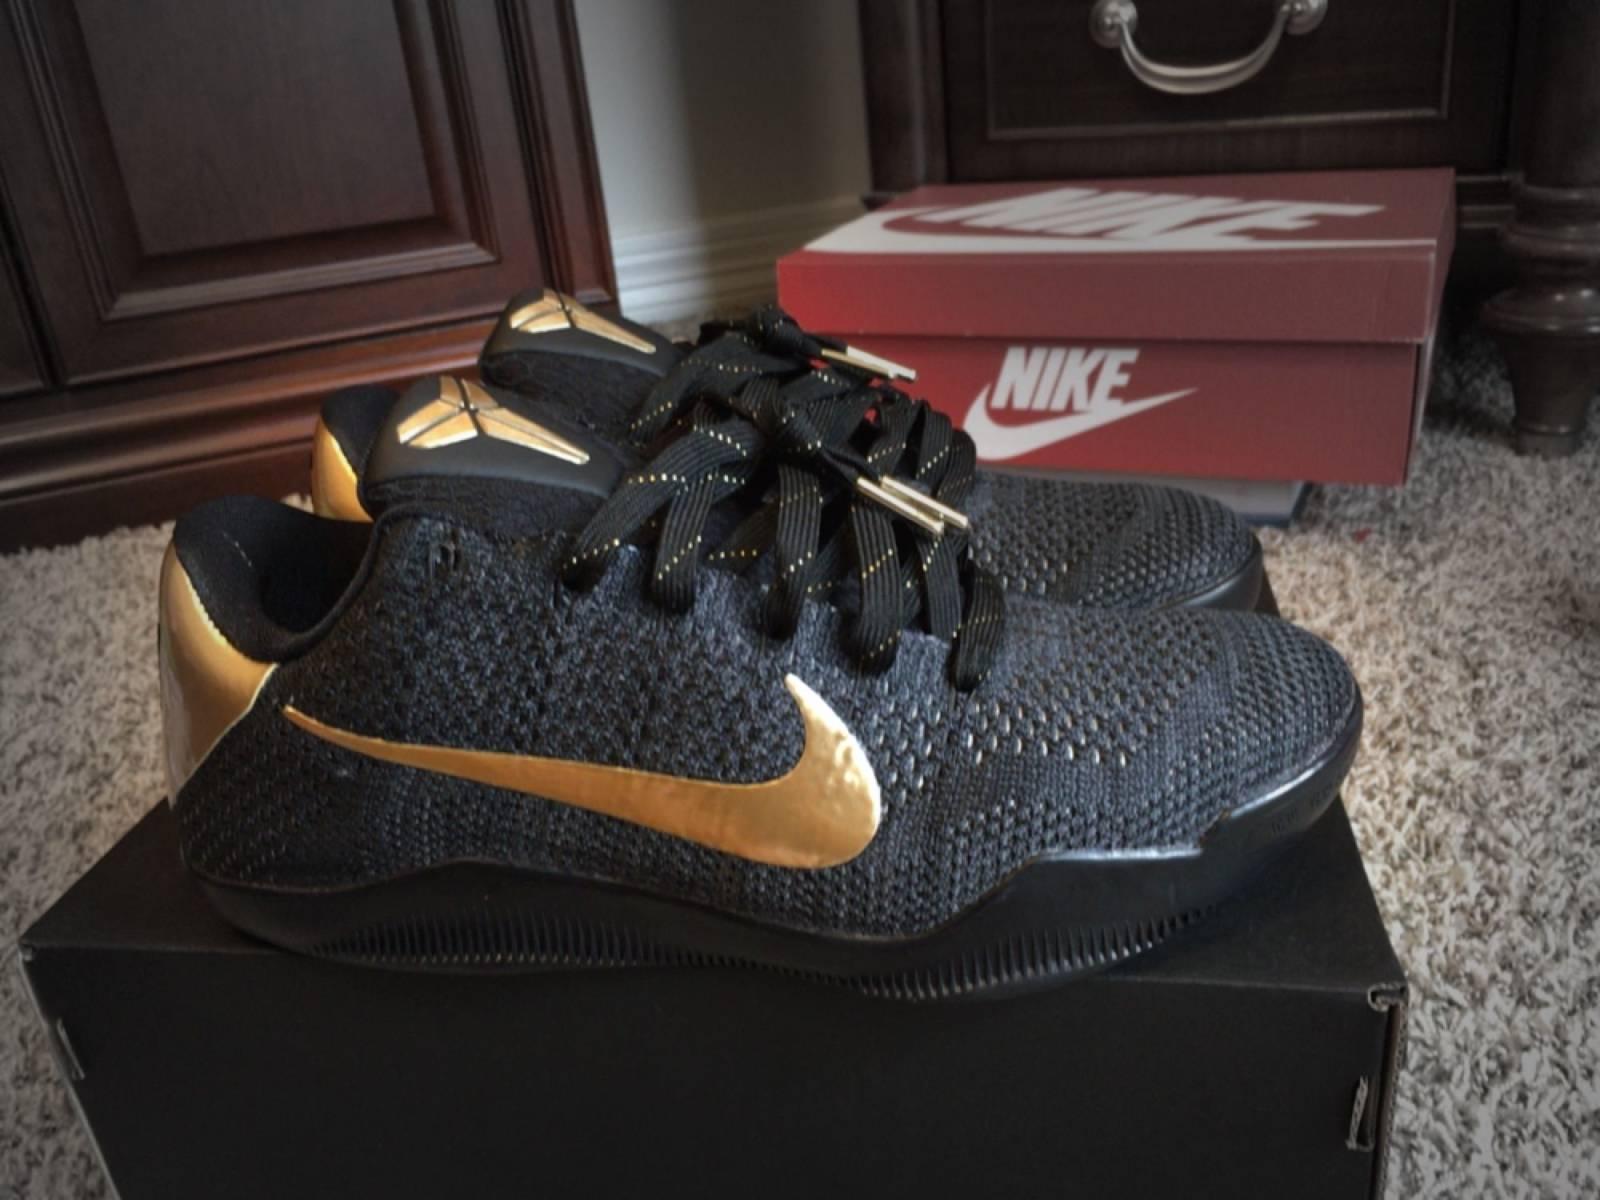 483a3c707a4b Nike Air Jordan 9 Retro